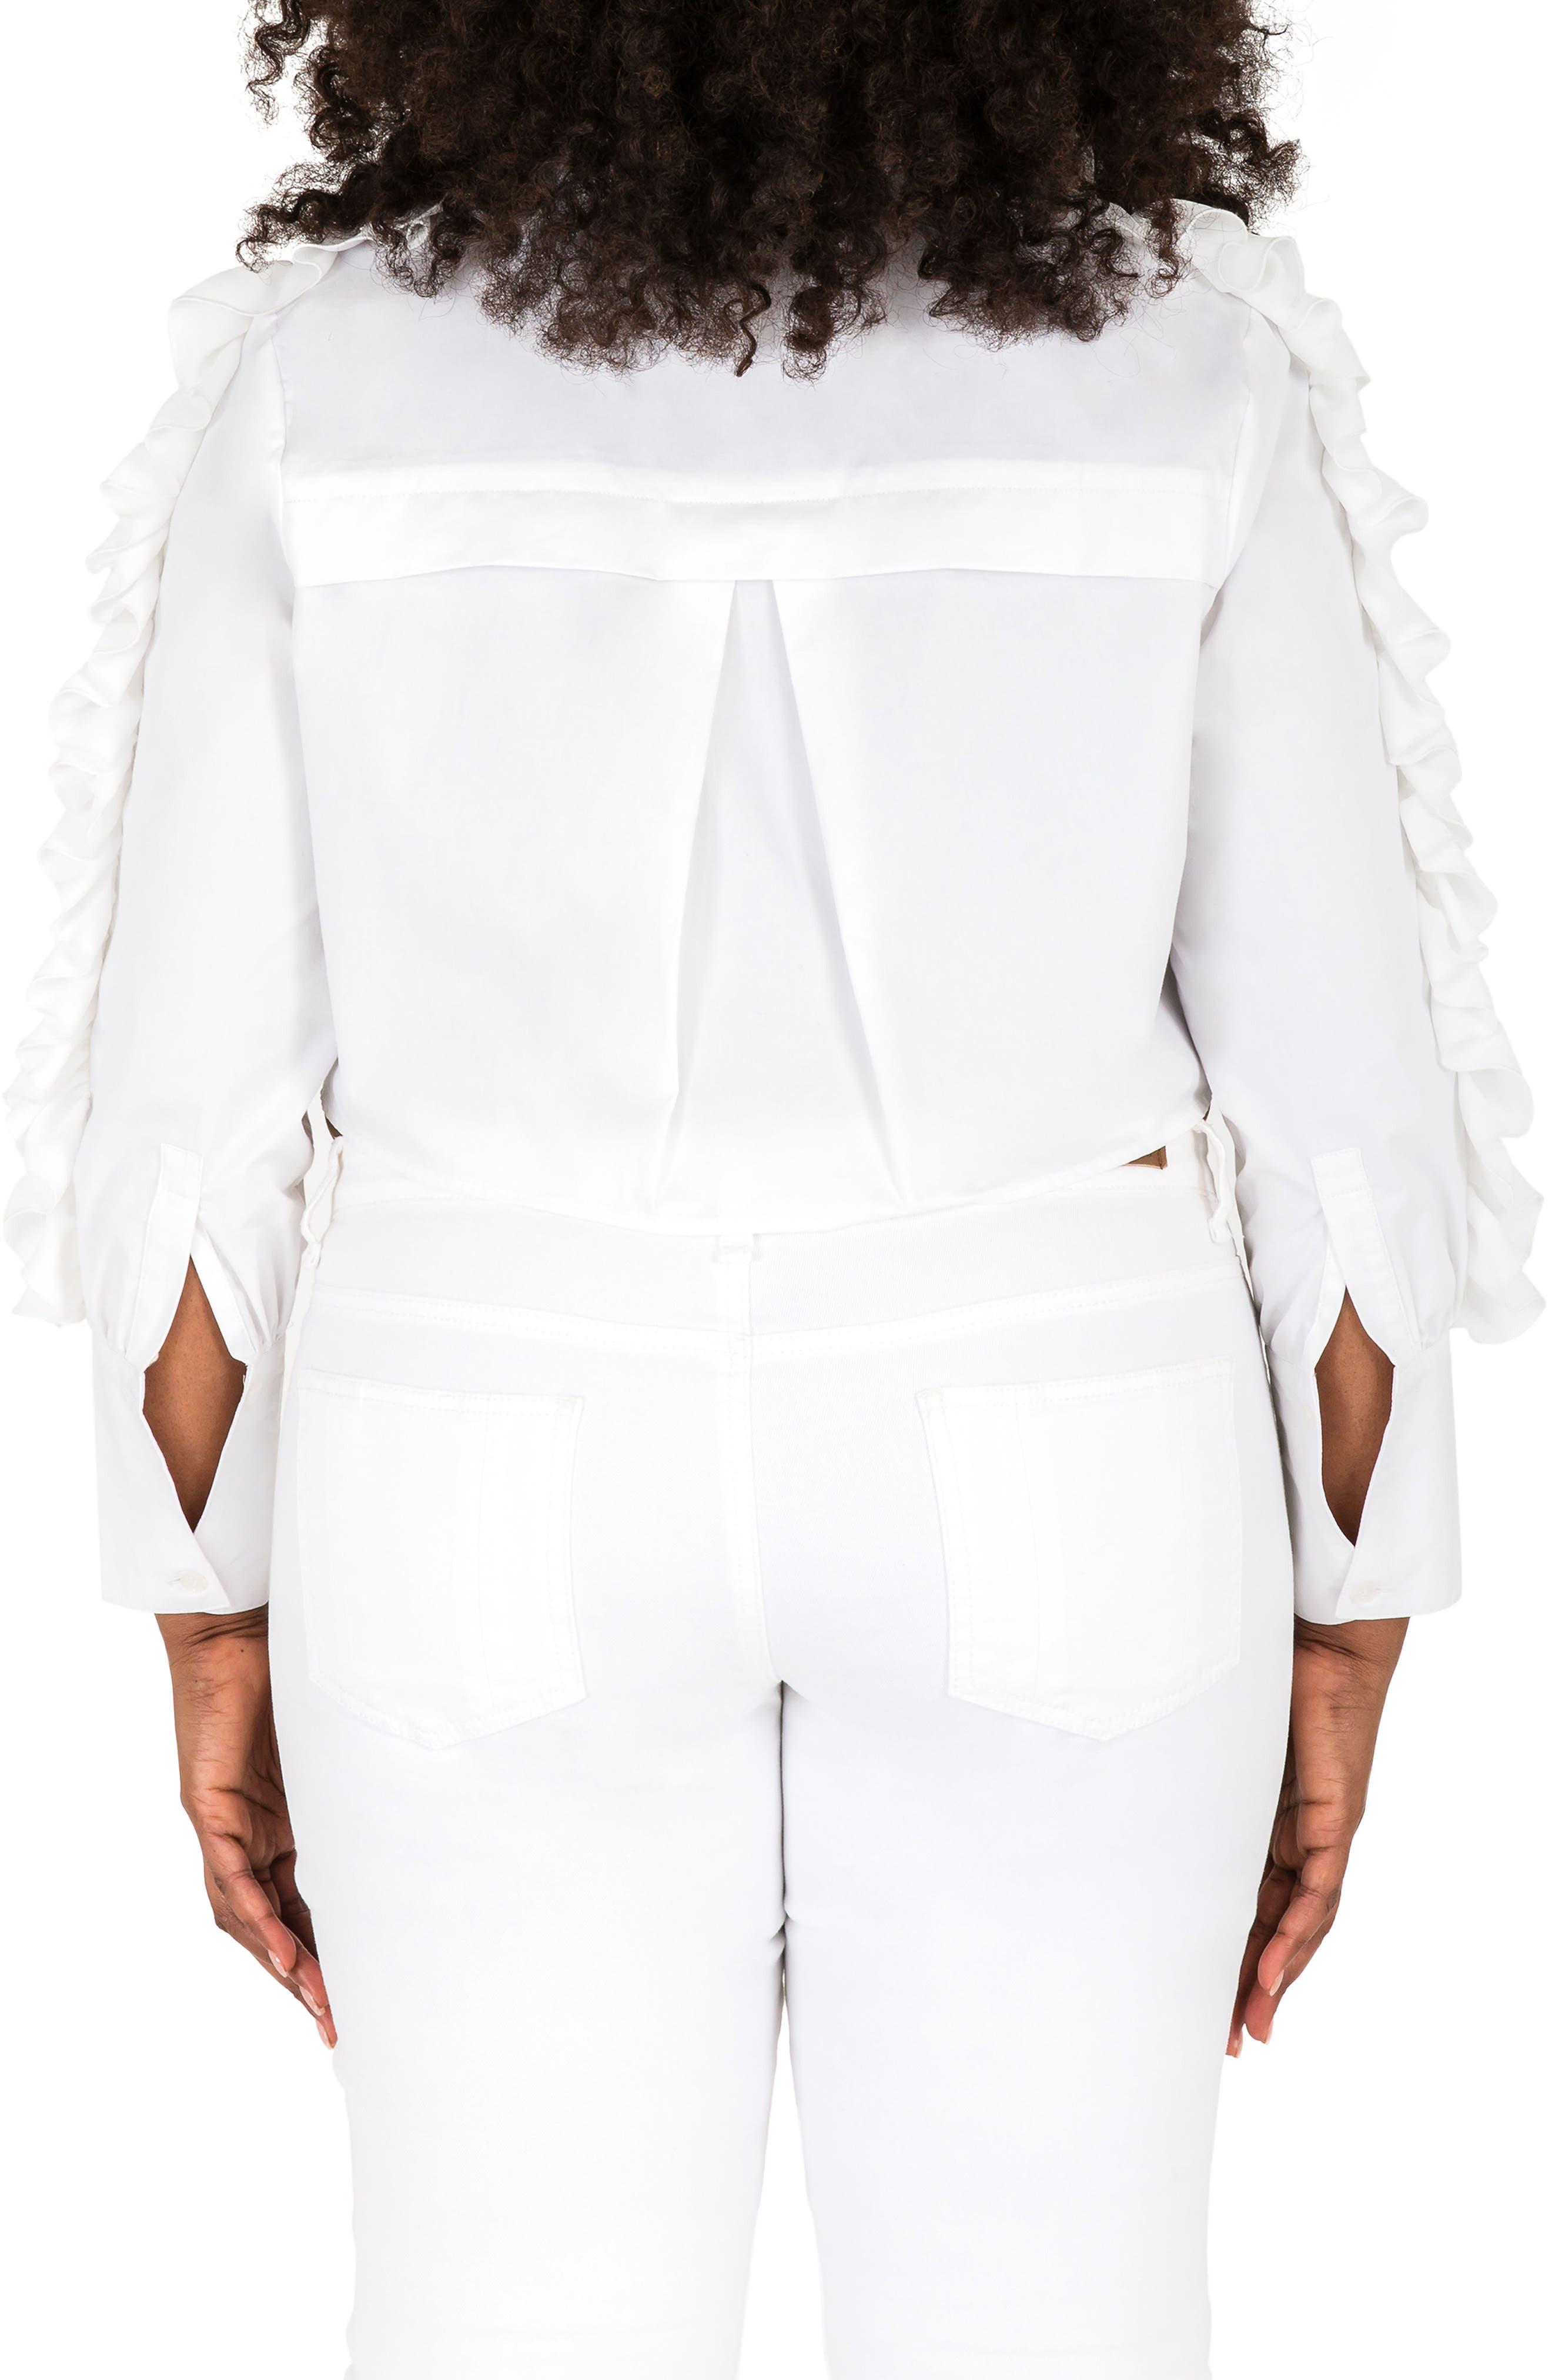 Mayasia Ruffle Sleeve Crop Shirt,                             Alternate thumbnail 2, color,                             White